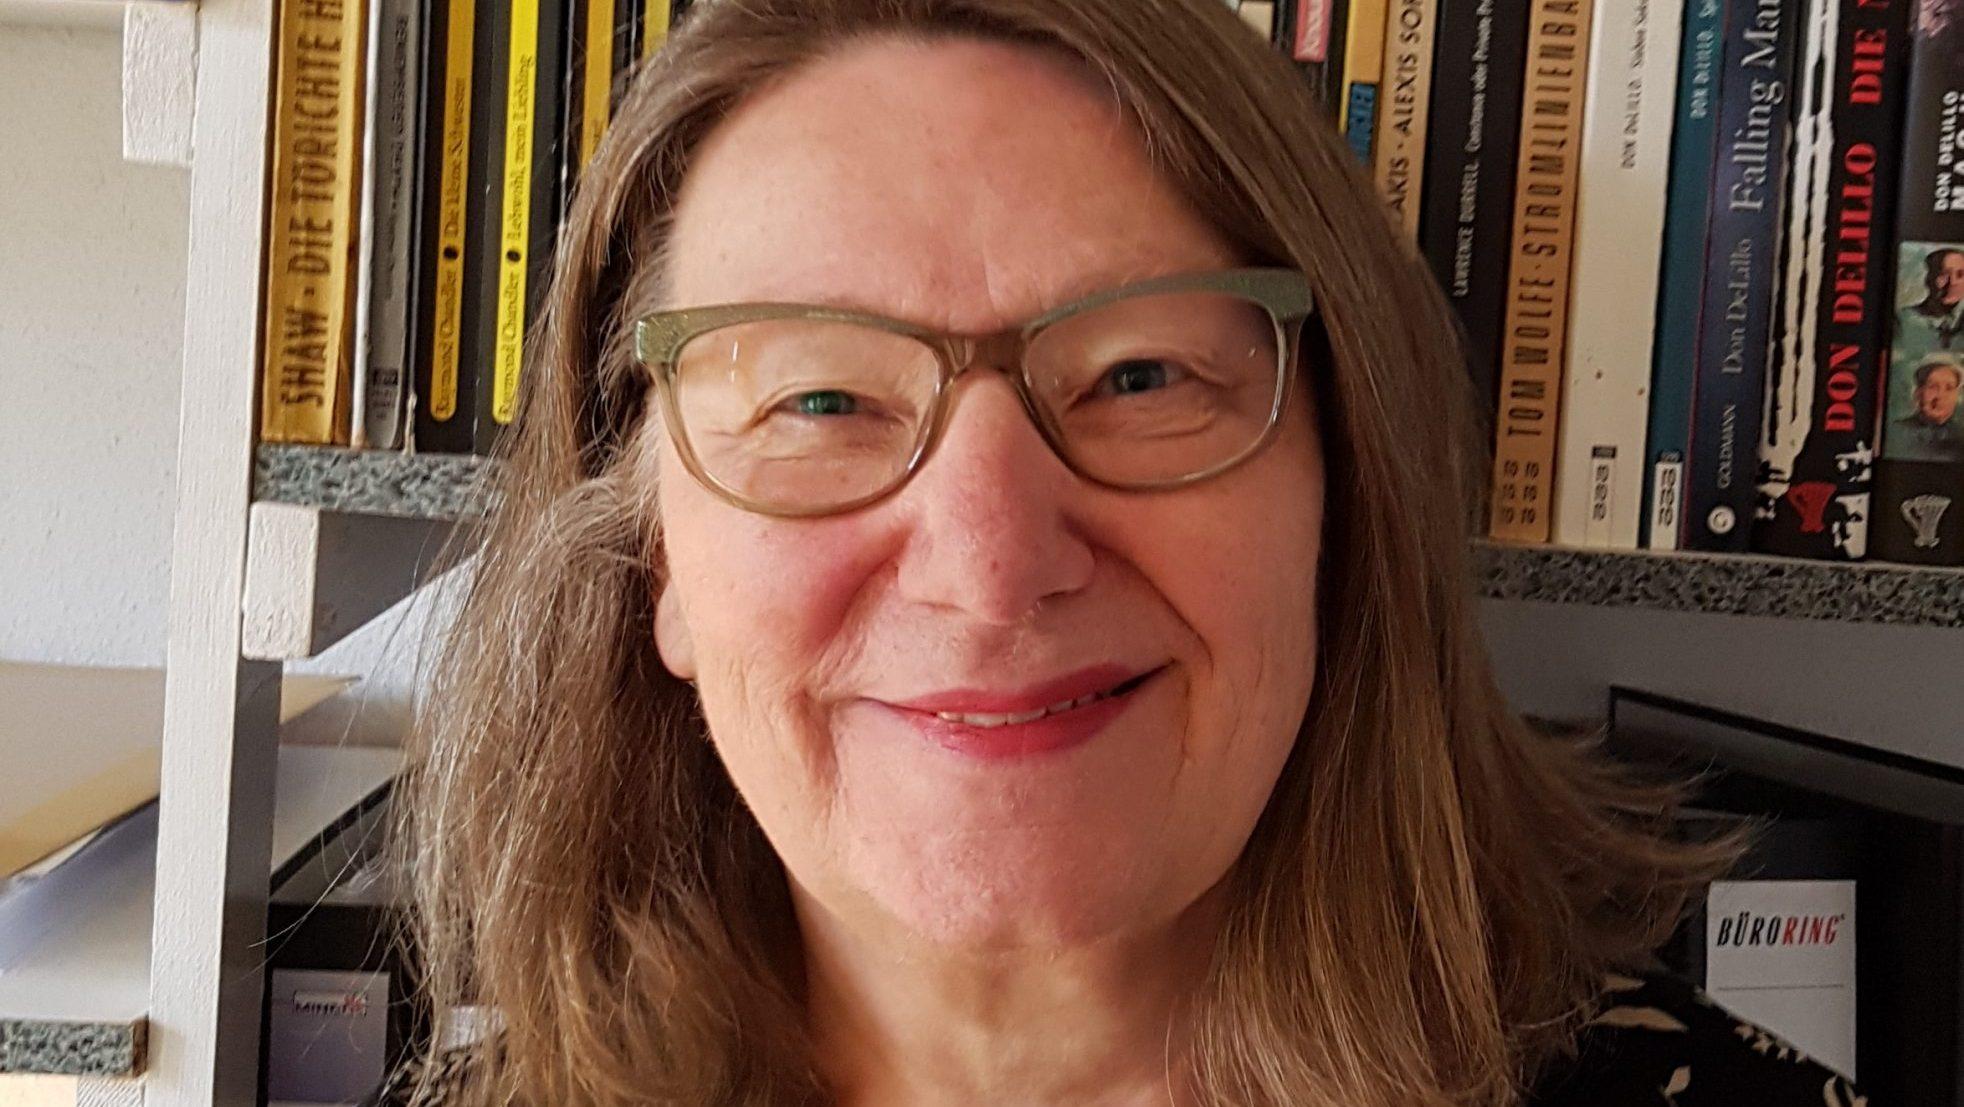 Frühe Frauenrechtlerinnen in Köln – Alice Neven Dumont und Else Frank